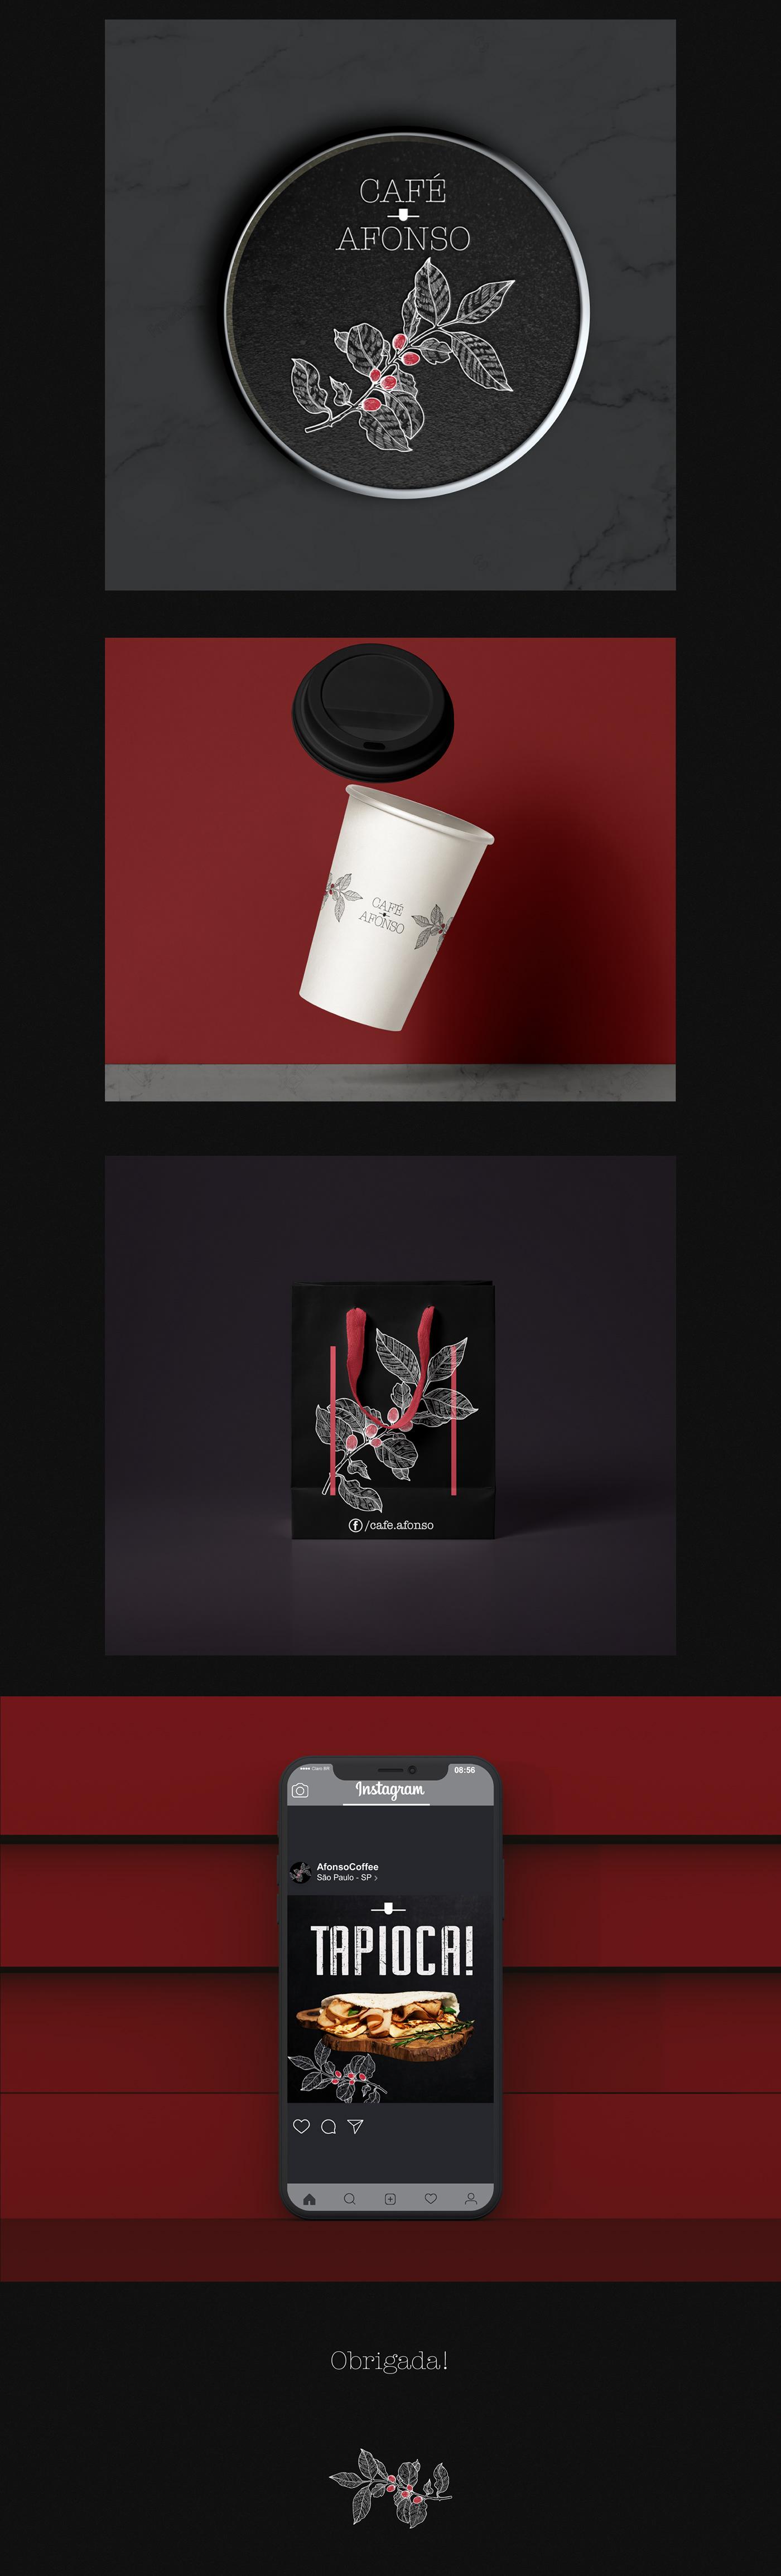 identidade visual visual identity coffee shop Photography  menu cardápio Fotografia social media mídias sociais cafe